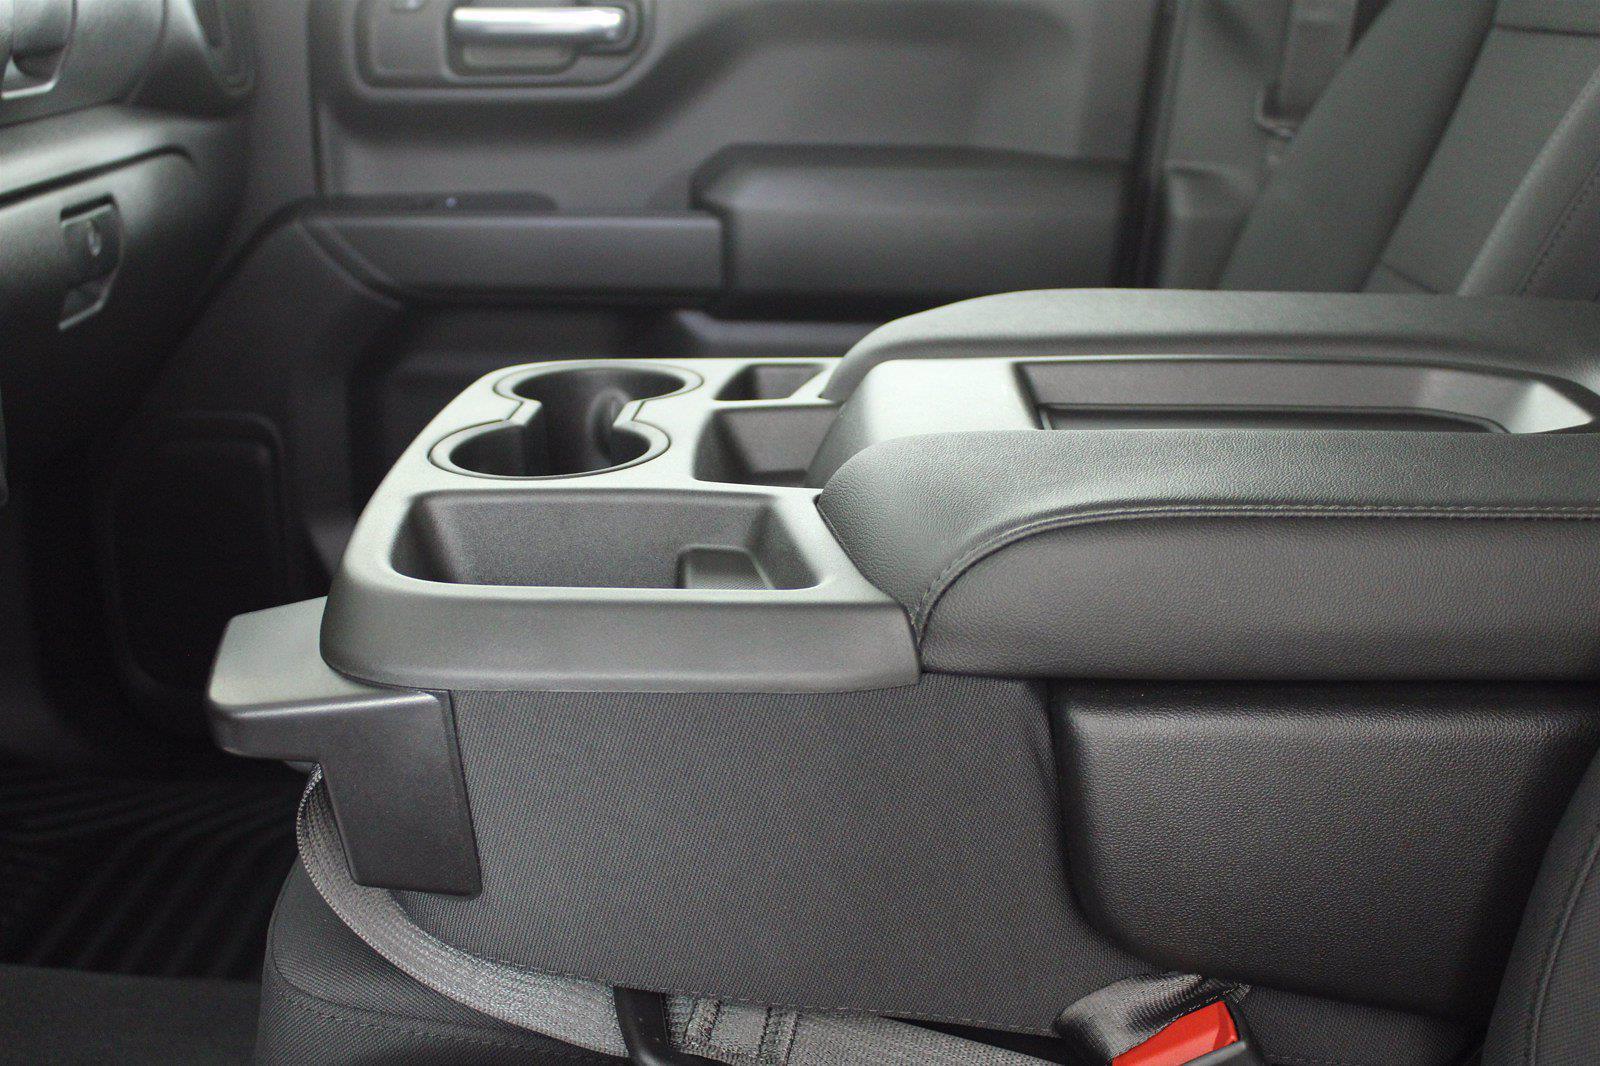 2020 Chevrolet Silverado 1500 Crew Cab 4x4, Pickup #DTC1713 - photo 15